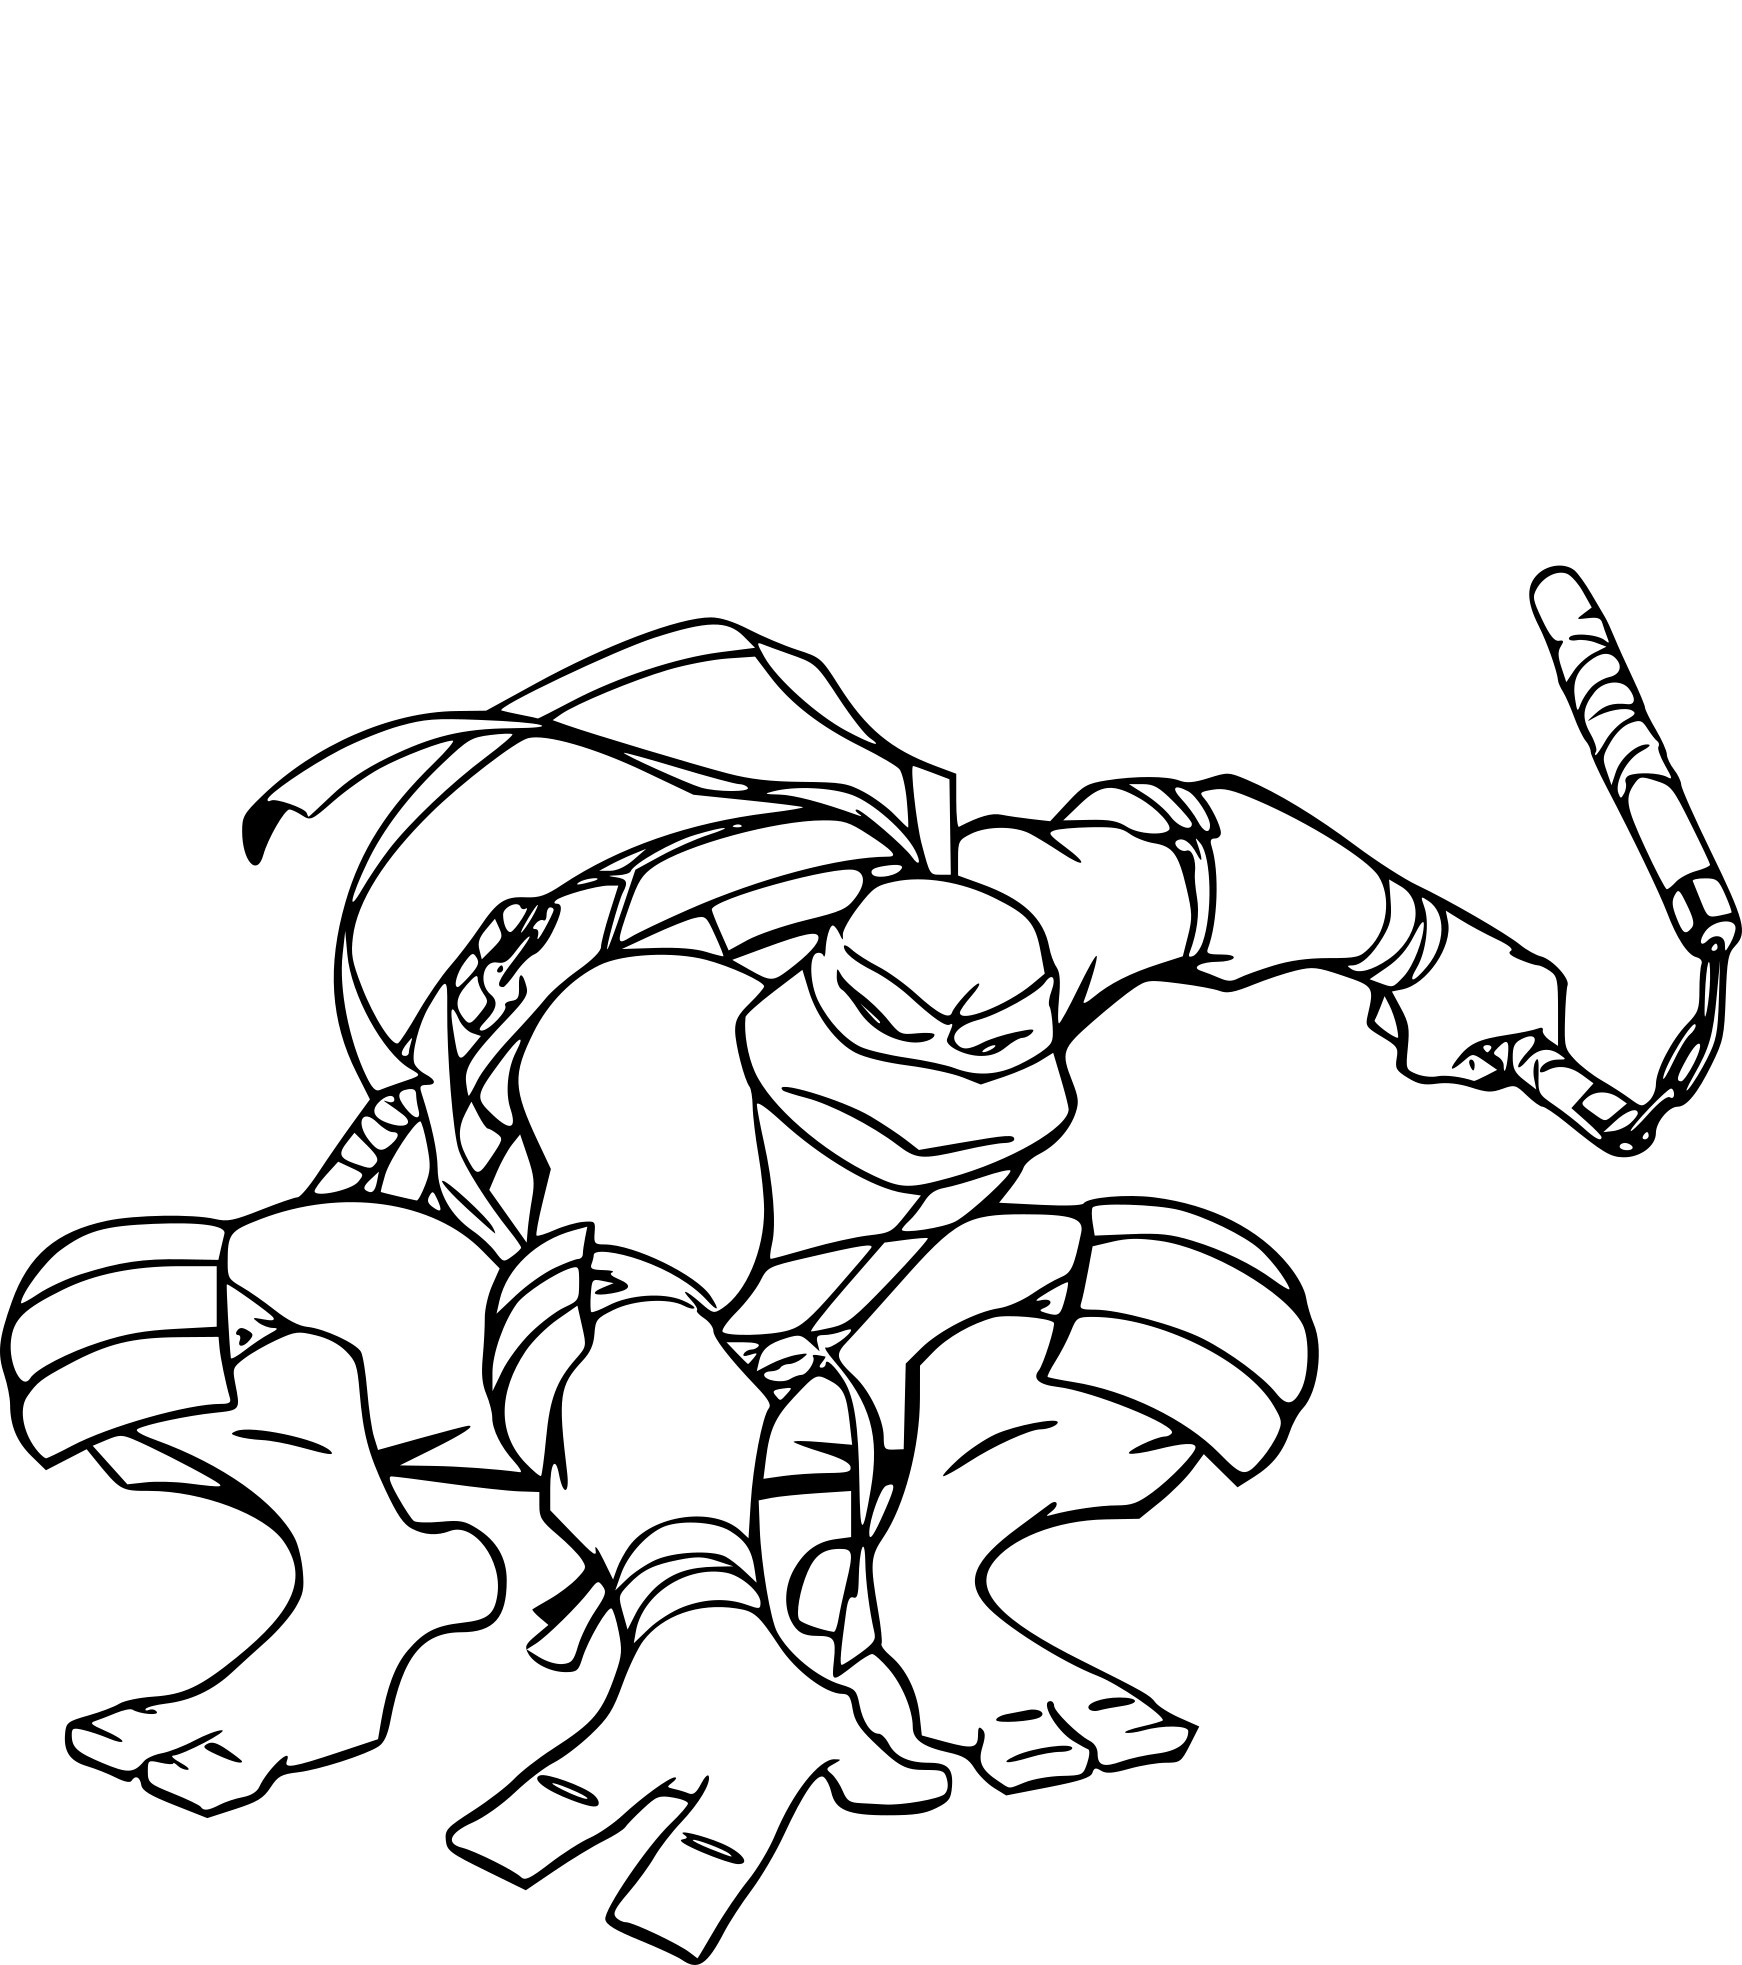 Coloriage Tortue Ninja Michelangelo À Imprimer Sur avec Dessin De Tortue Ninja